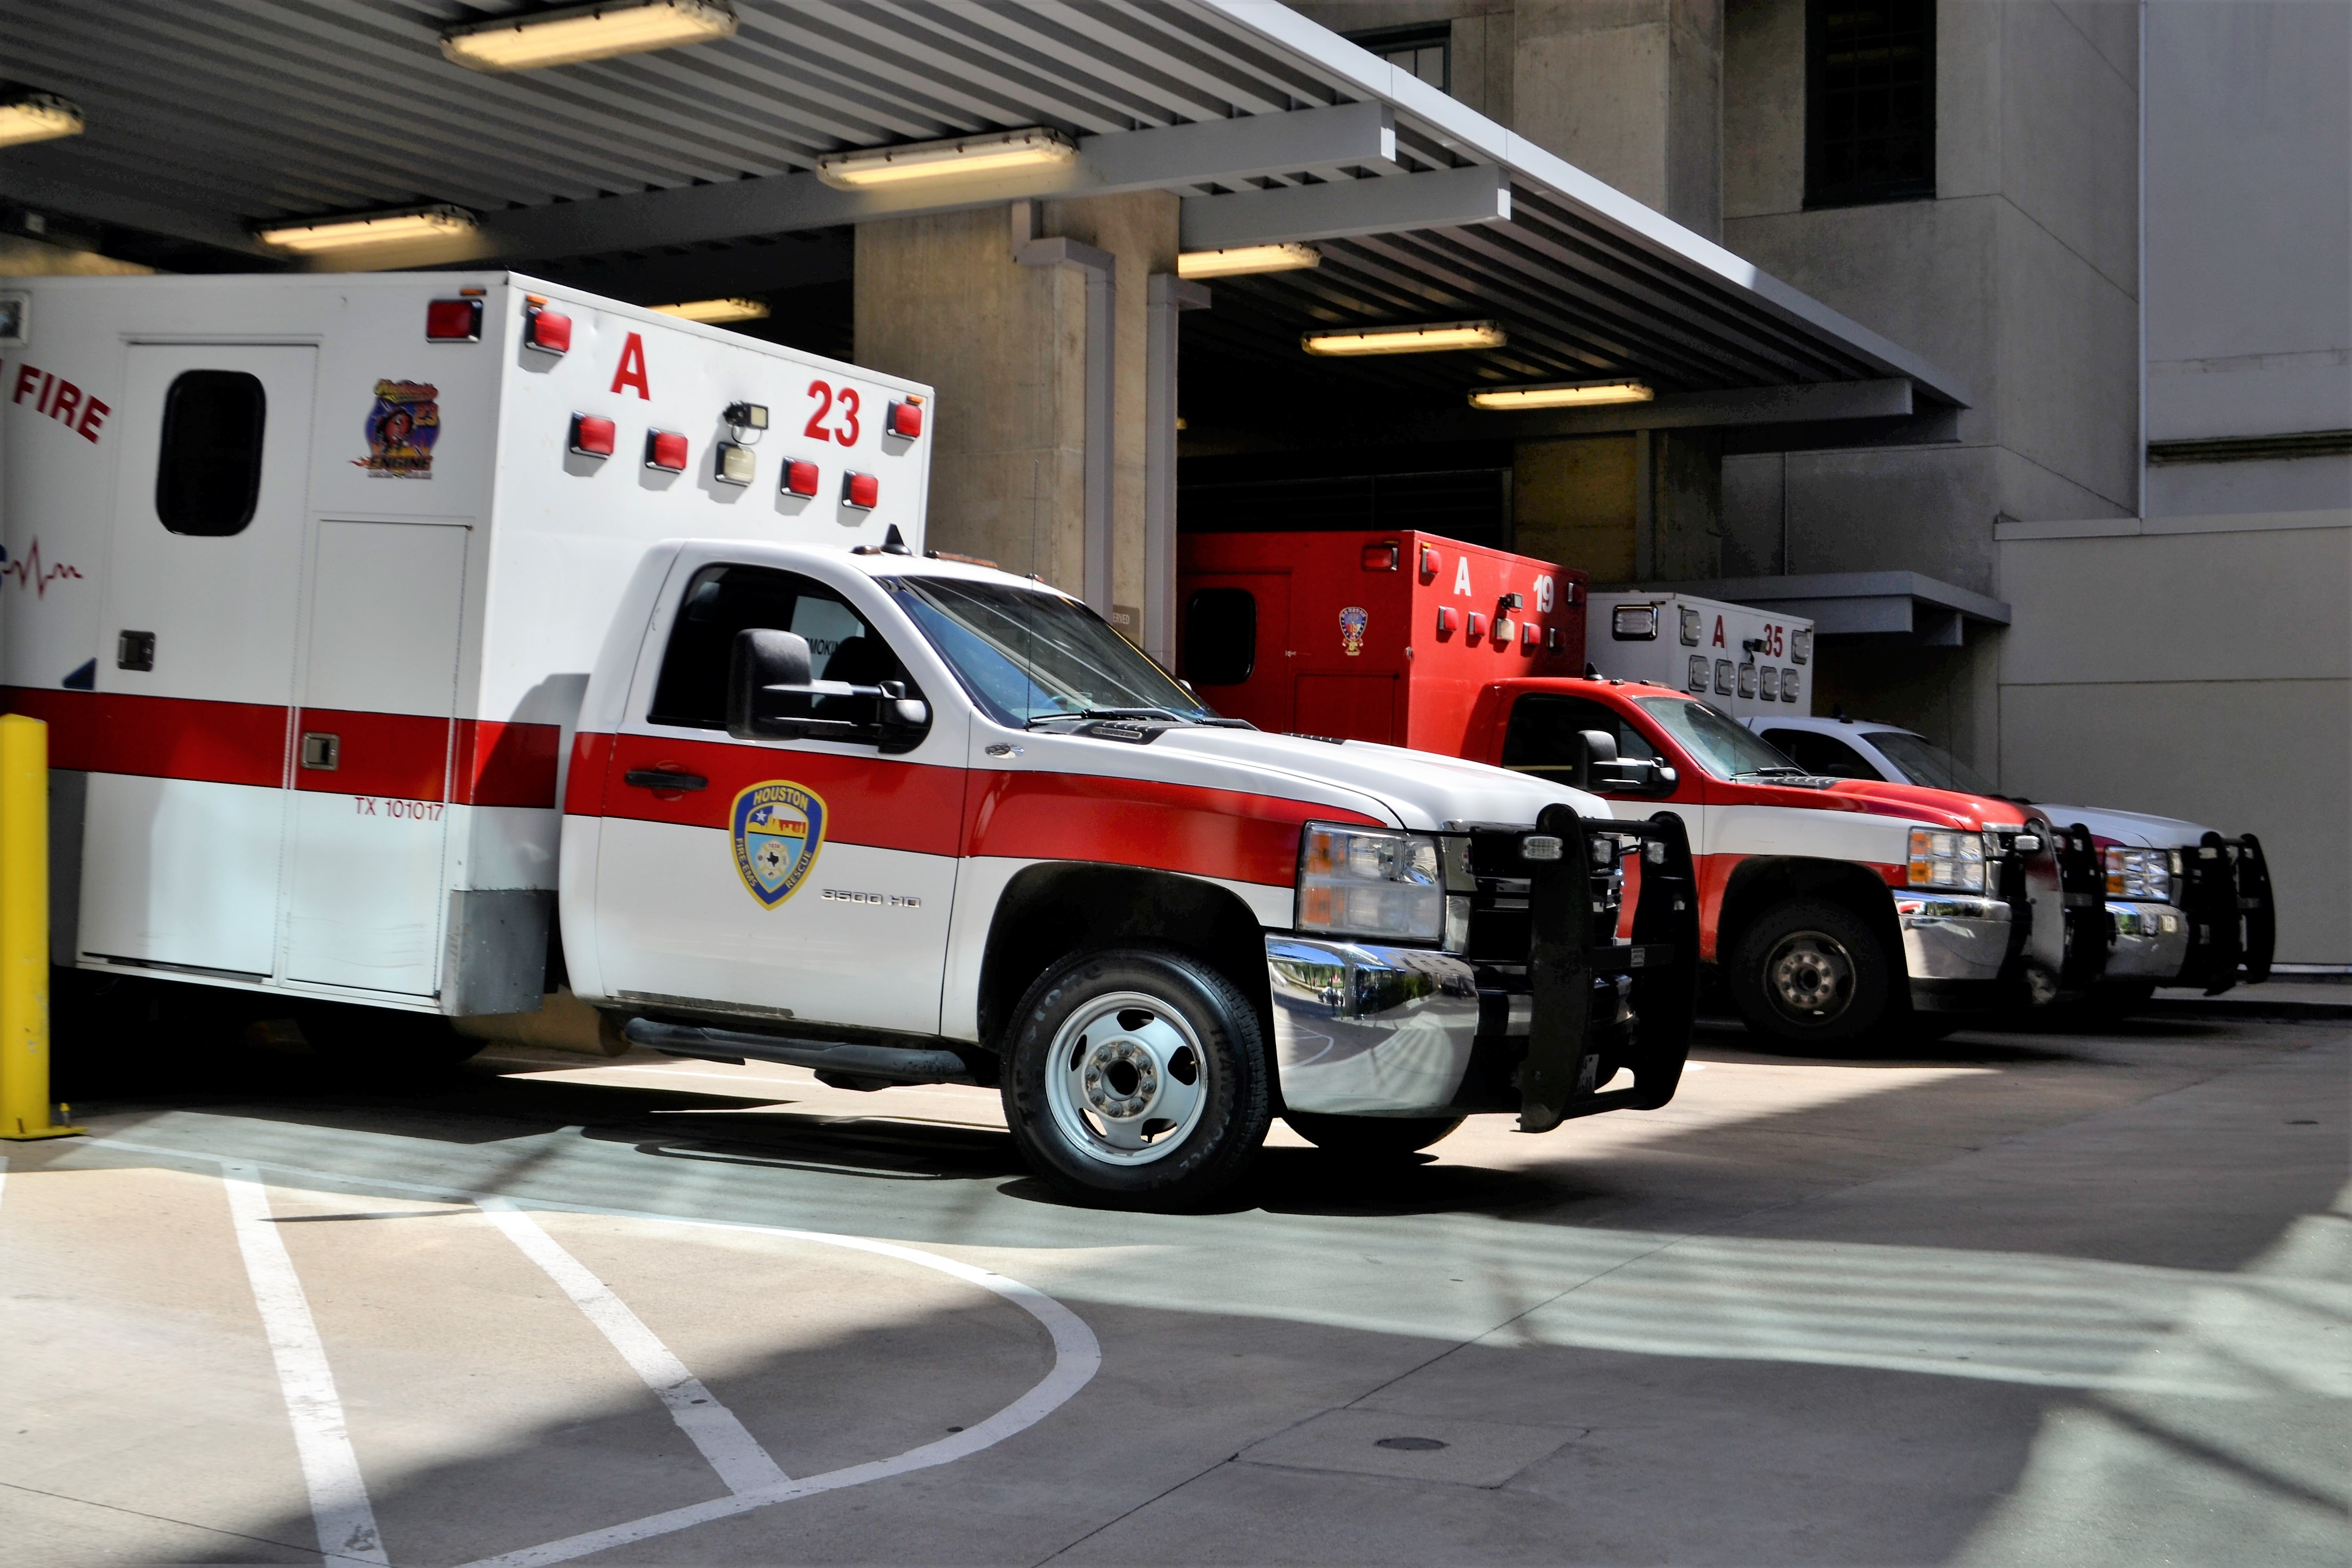 Ole Miss freshman airlifted to hospital   NewsTalk 610 AM & 103.9 FM